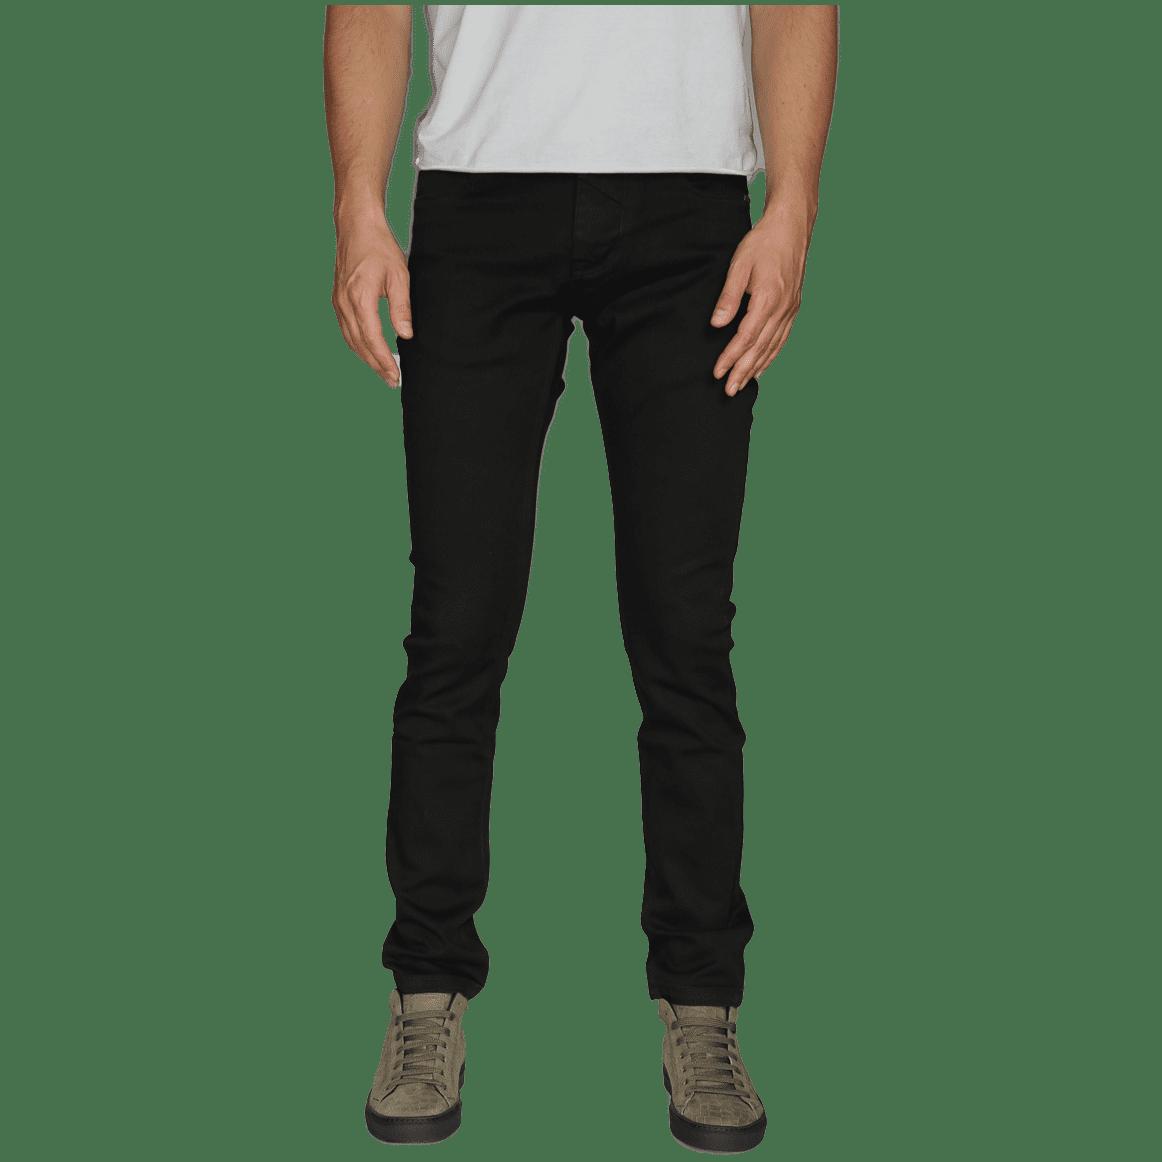 Cabinero Stiles Berlin Jeans Johnny Love, schwarz Herrenhosen 2017 1